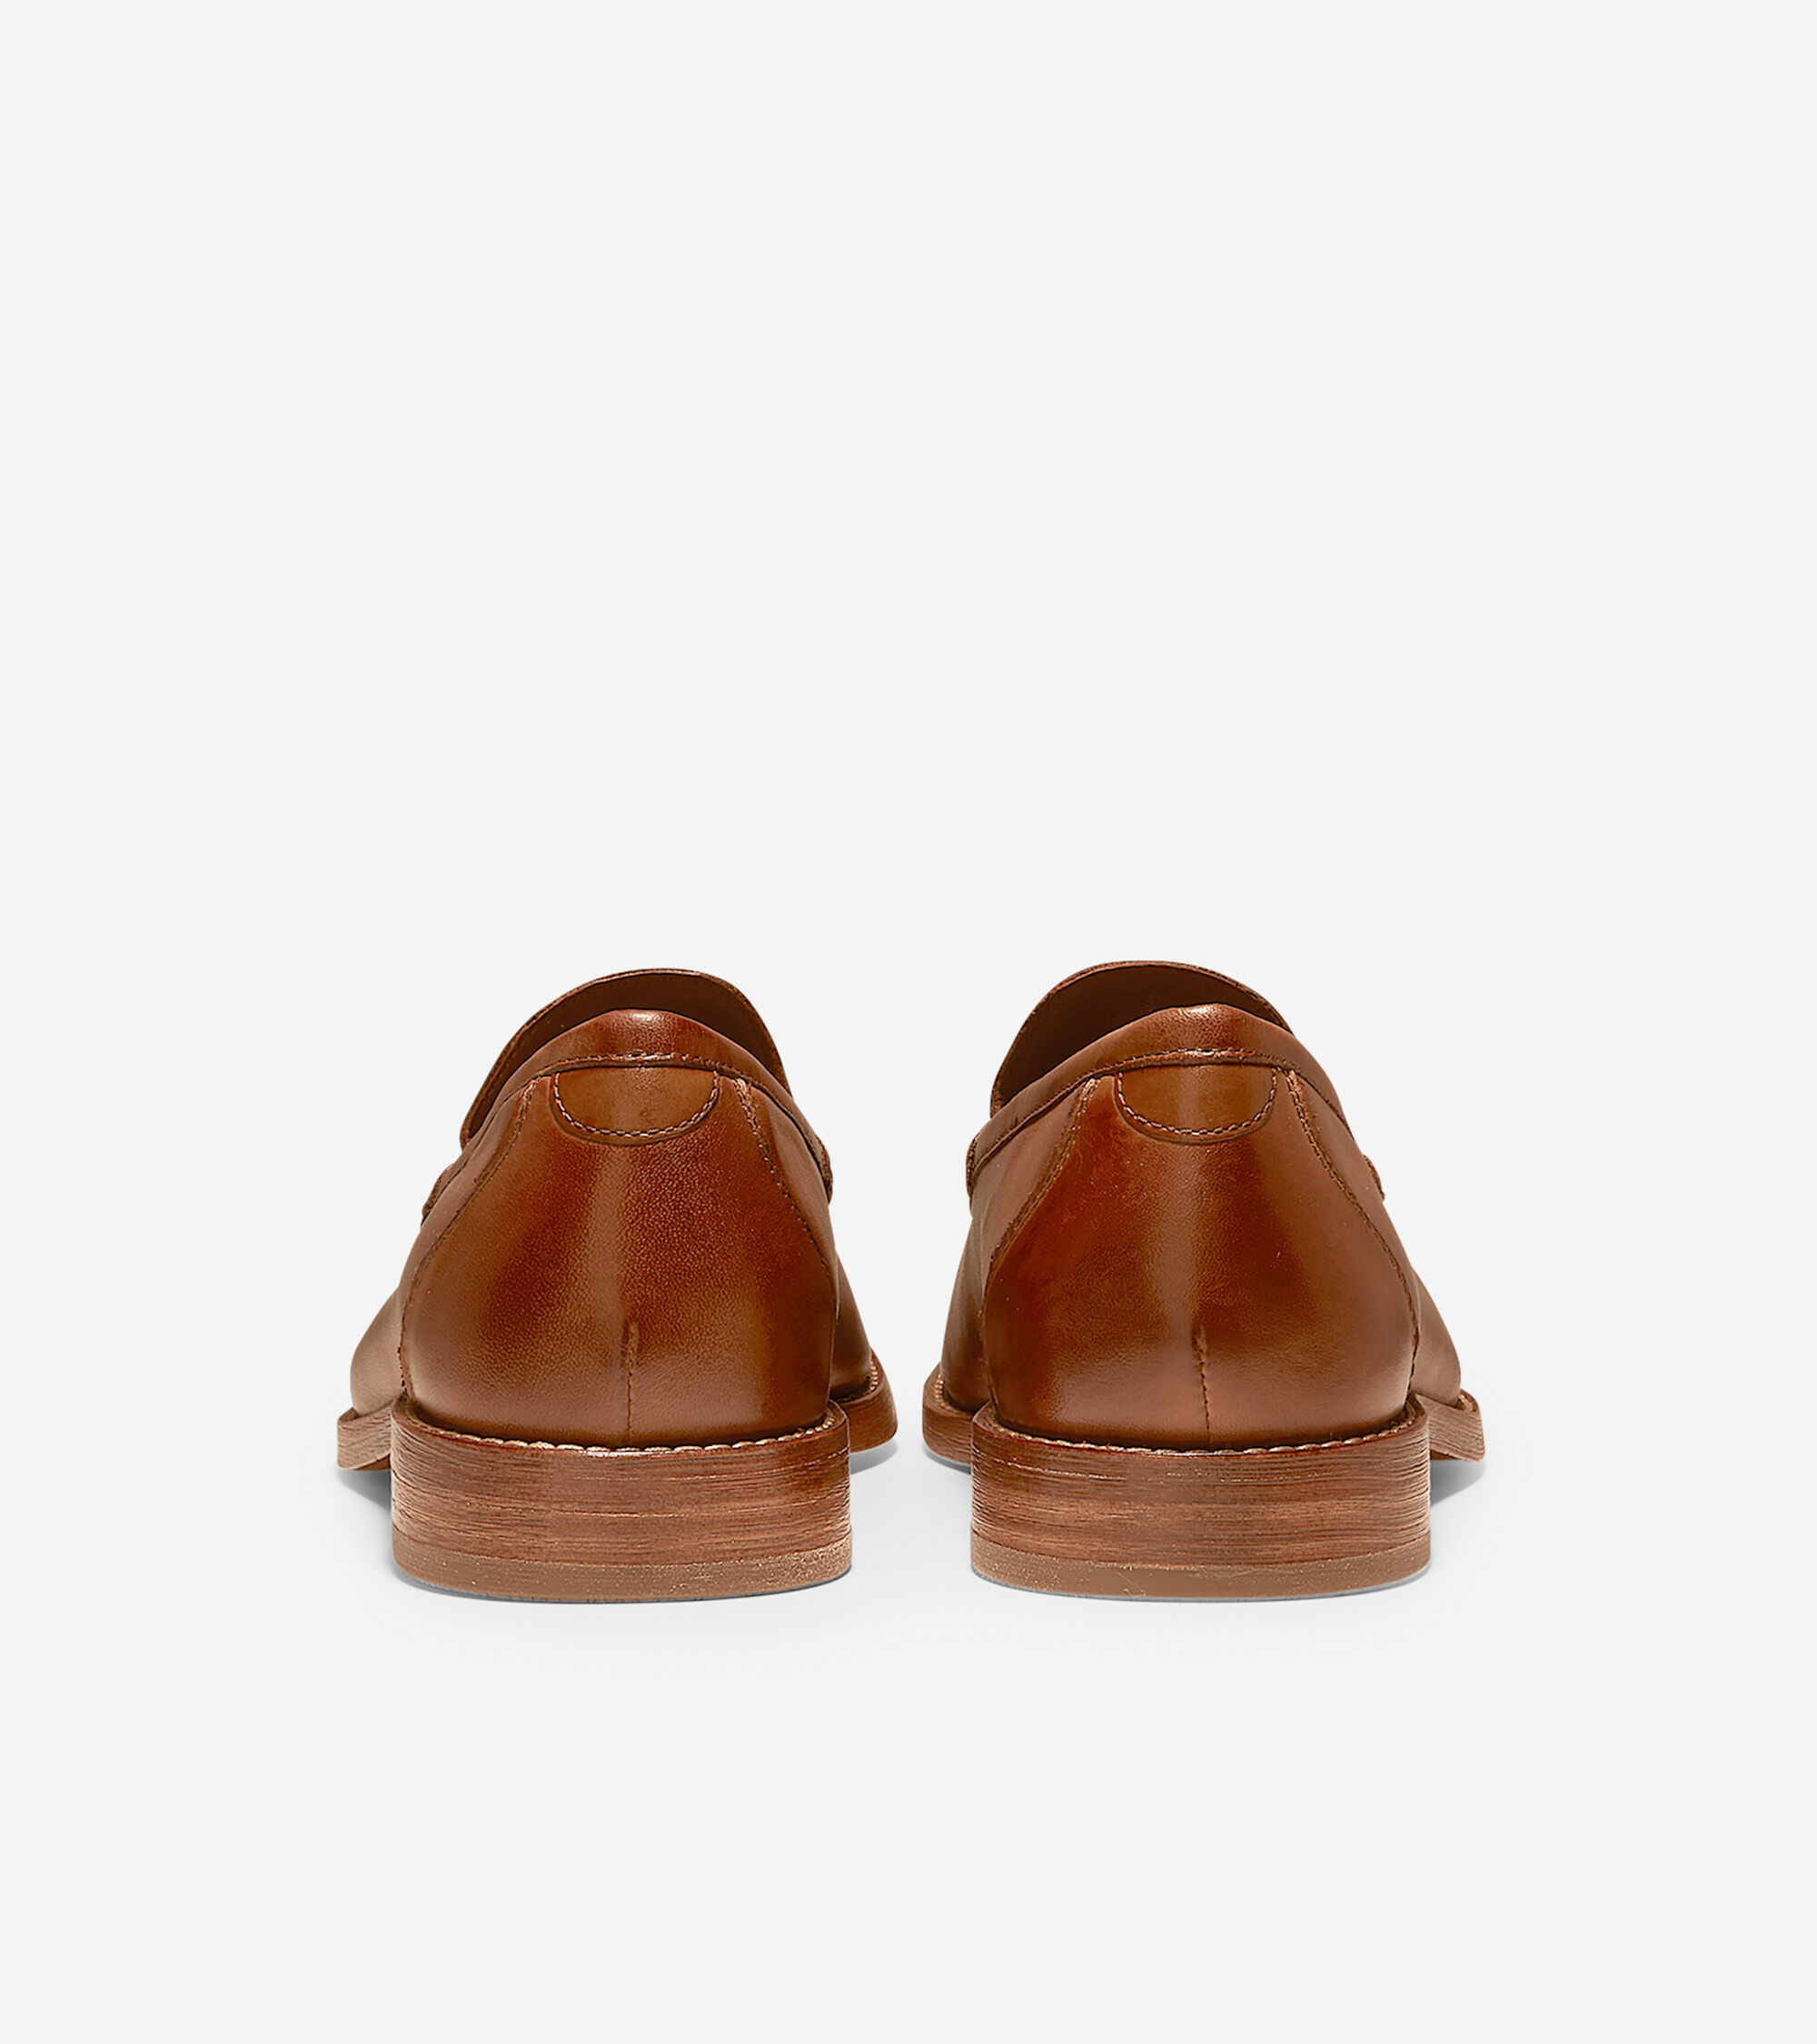 1ff6d8c625d Men s Feathercraft Grand Venetian Loafers in British Tan